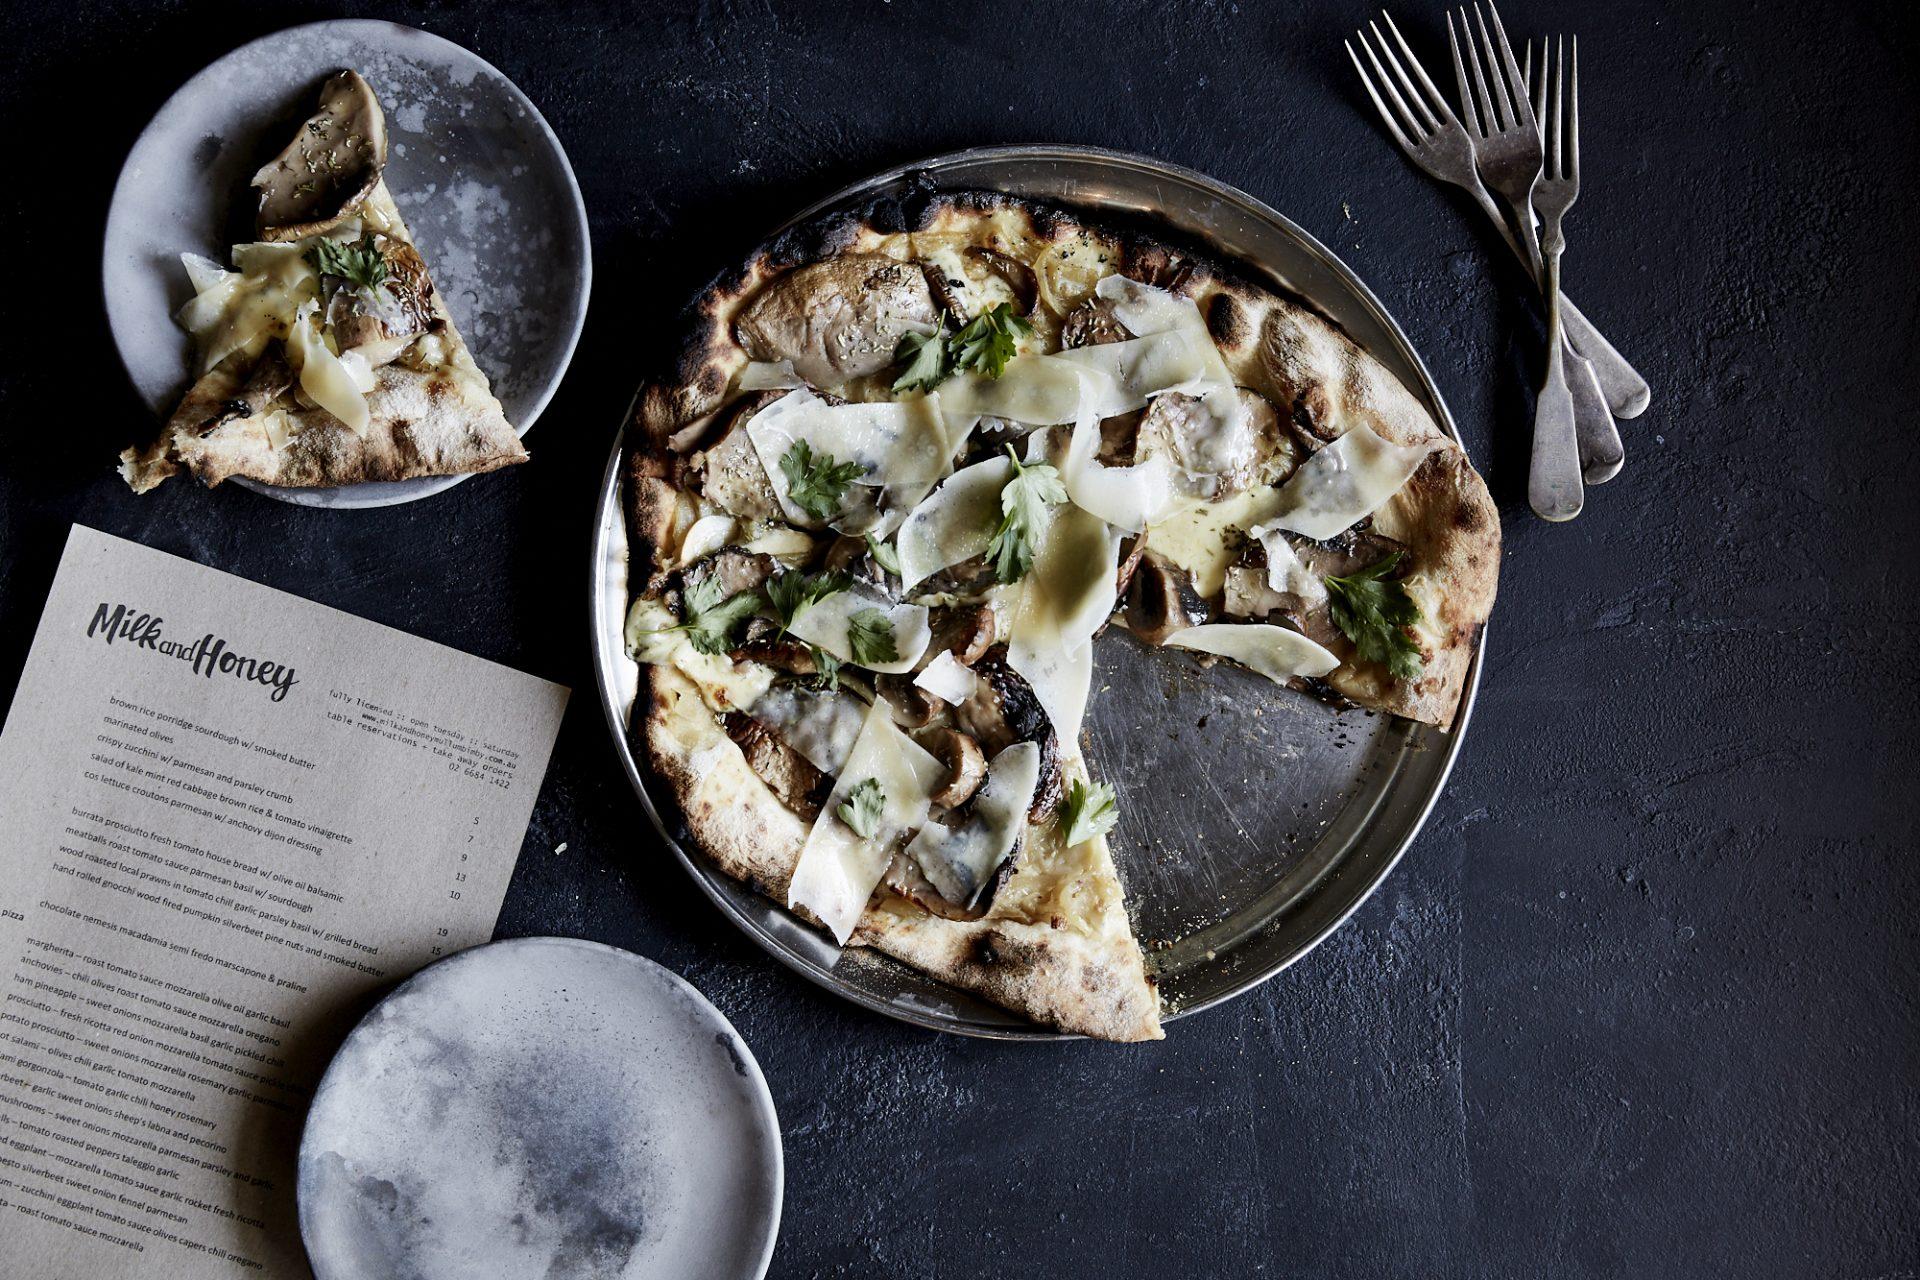 Milk & Honey woodfired pizza in Mullumbimby